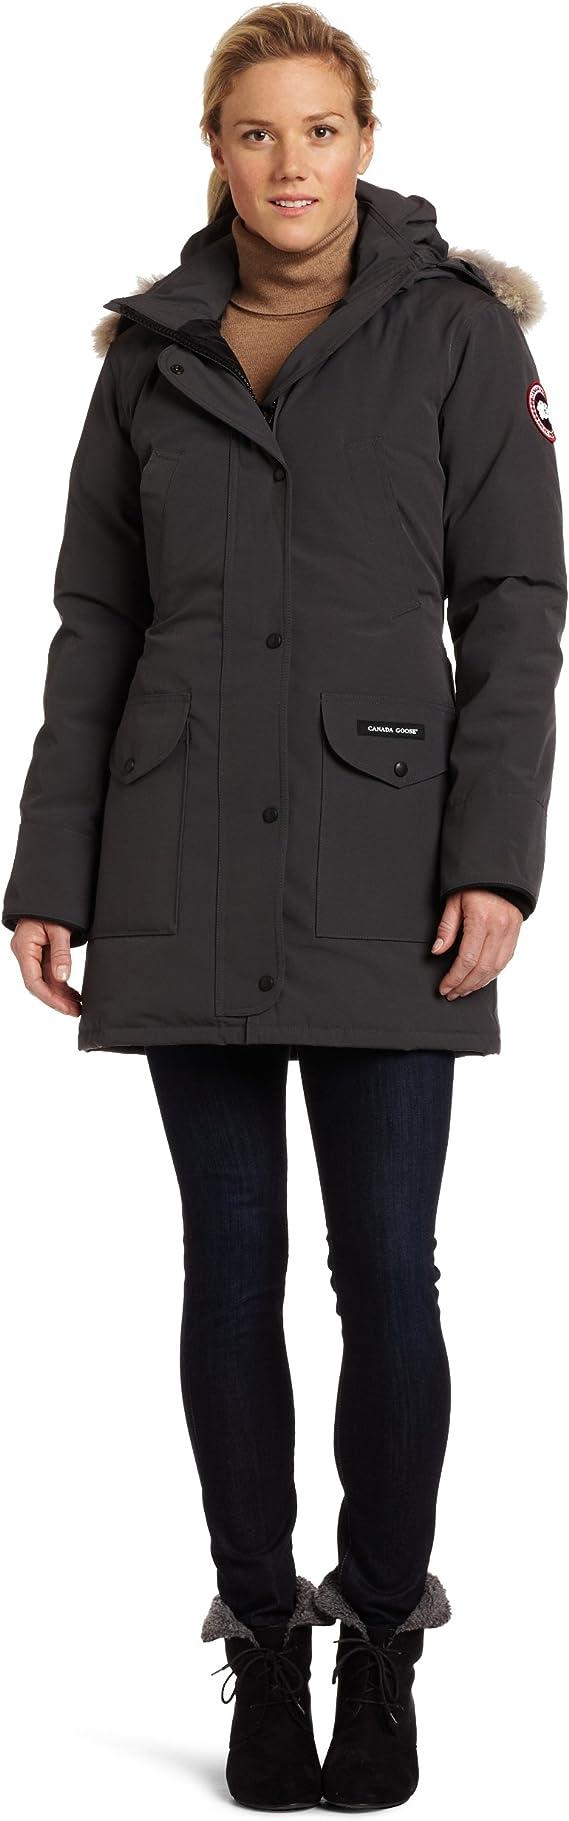 Canada Goose 加拿大鹅 Trillium 女式羽绒服 6550L XS码8.5折$845.5 海淘转运到手约¥5611